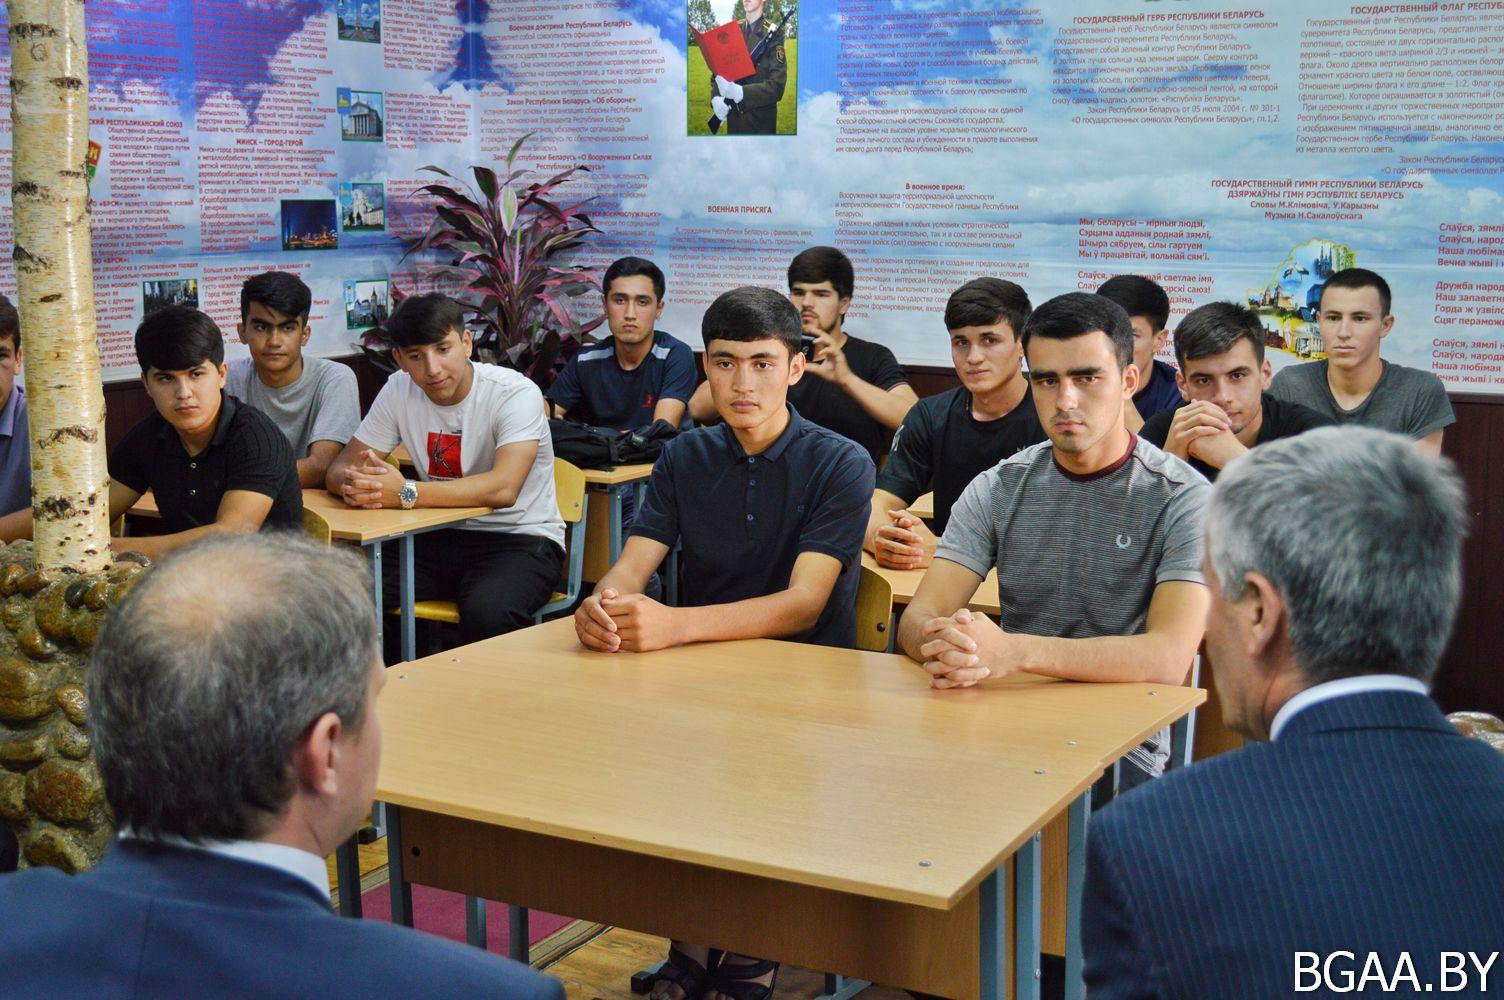 Таджикистан изучил условия обучения в БГАА